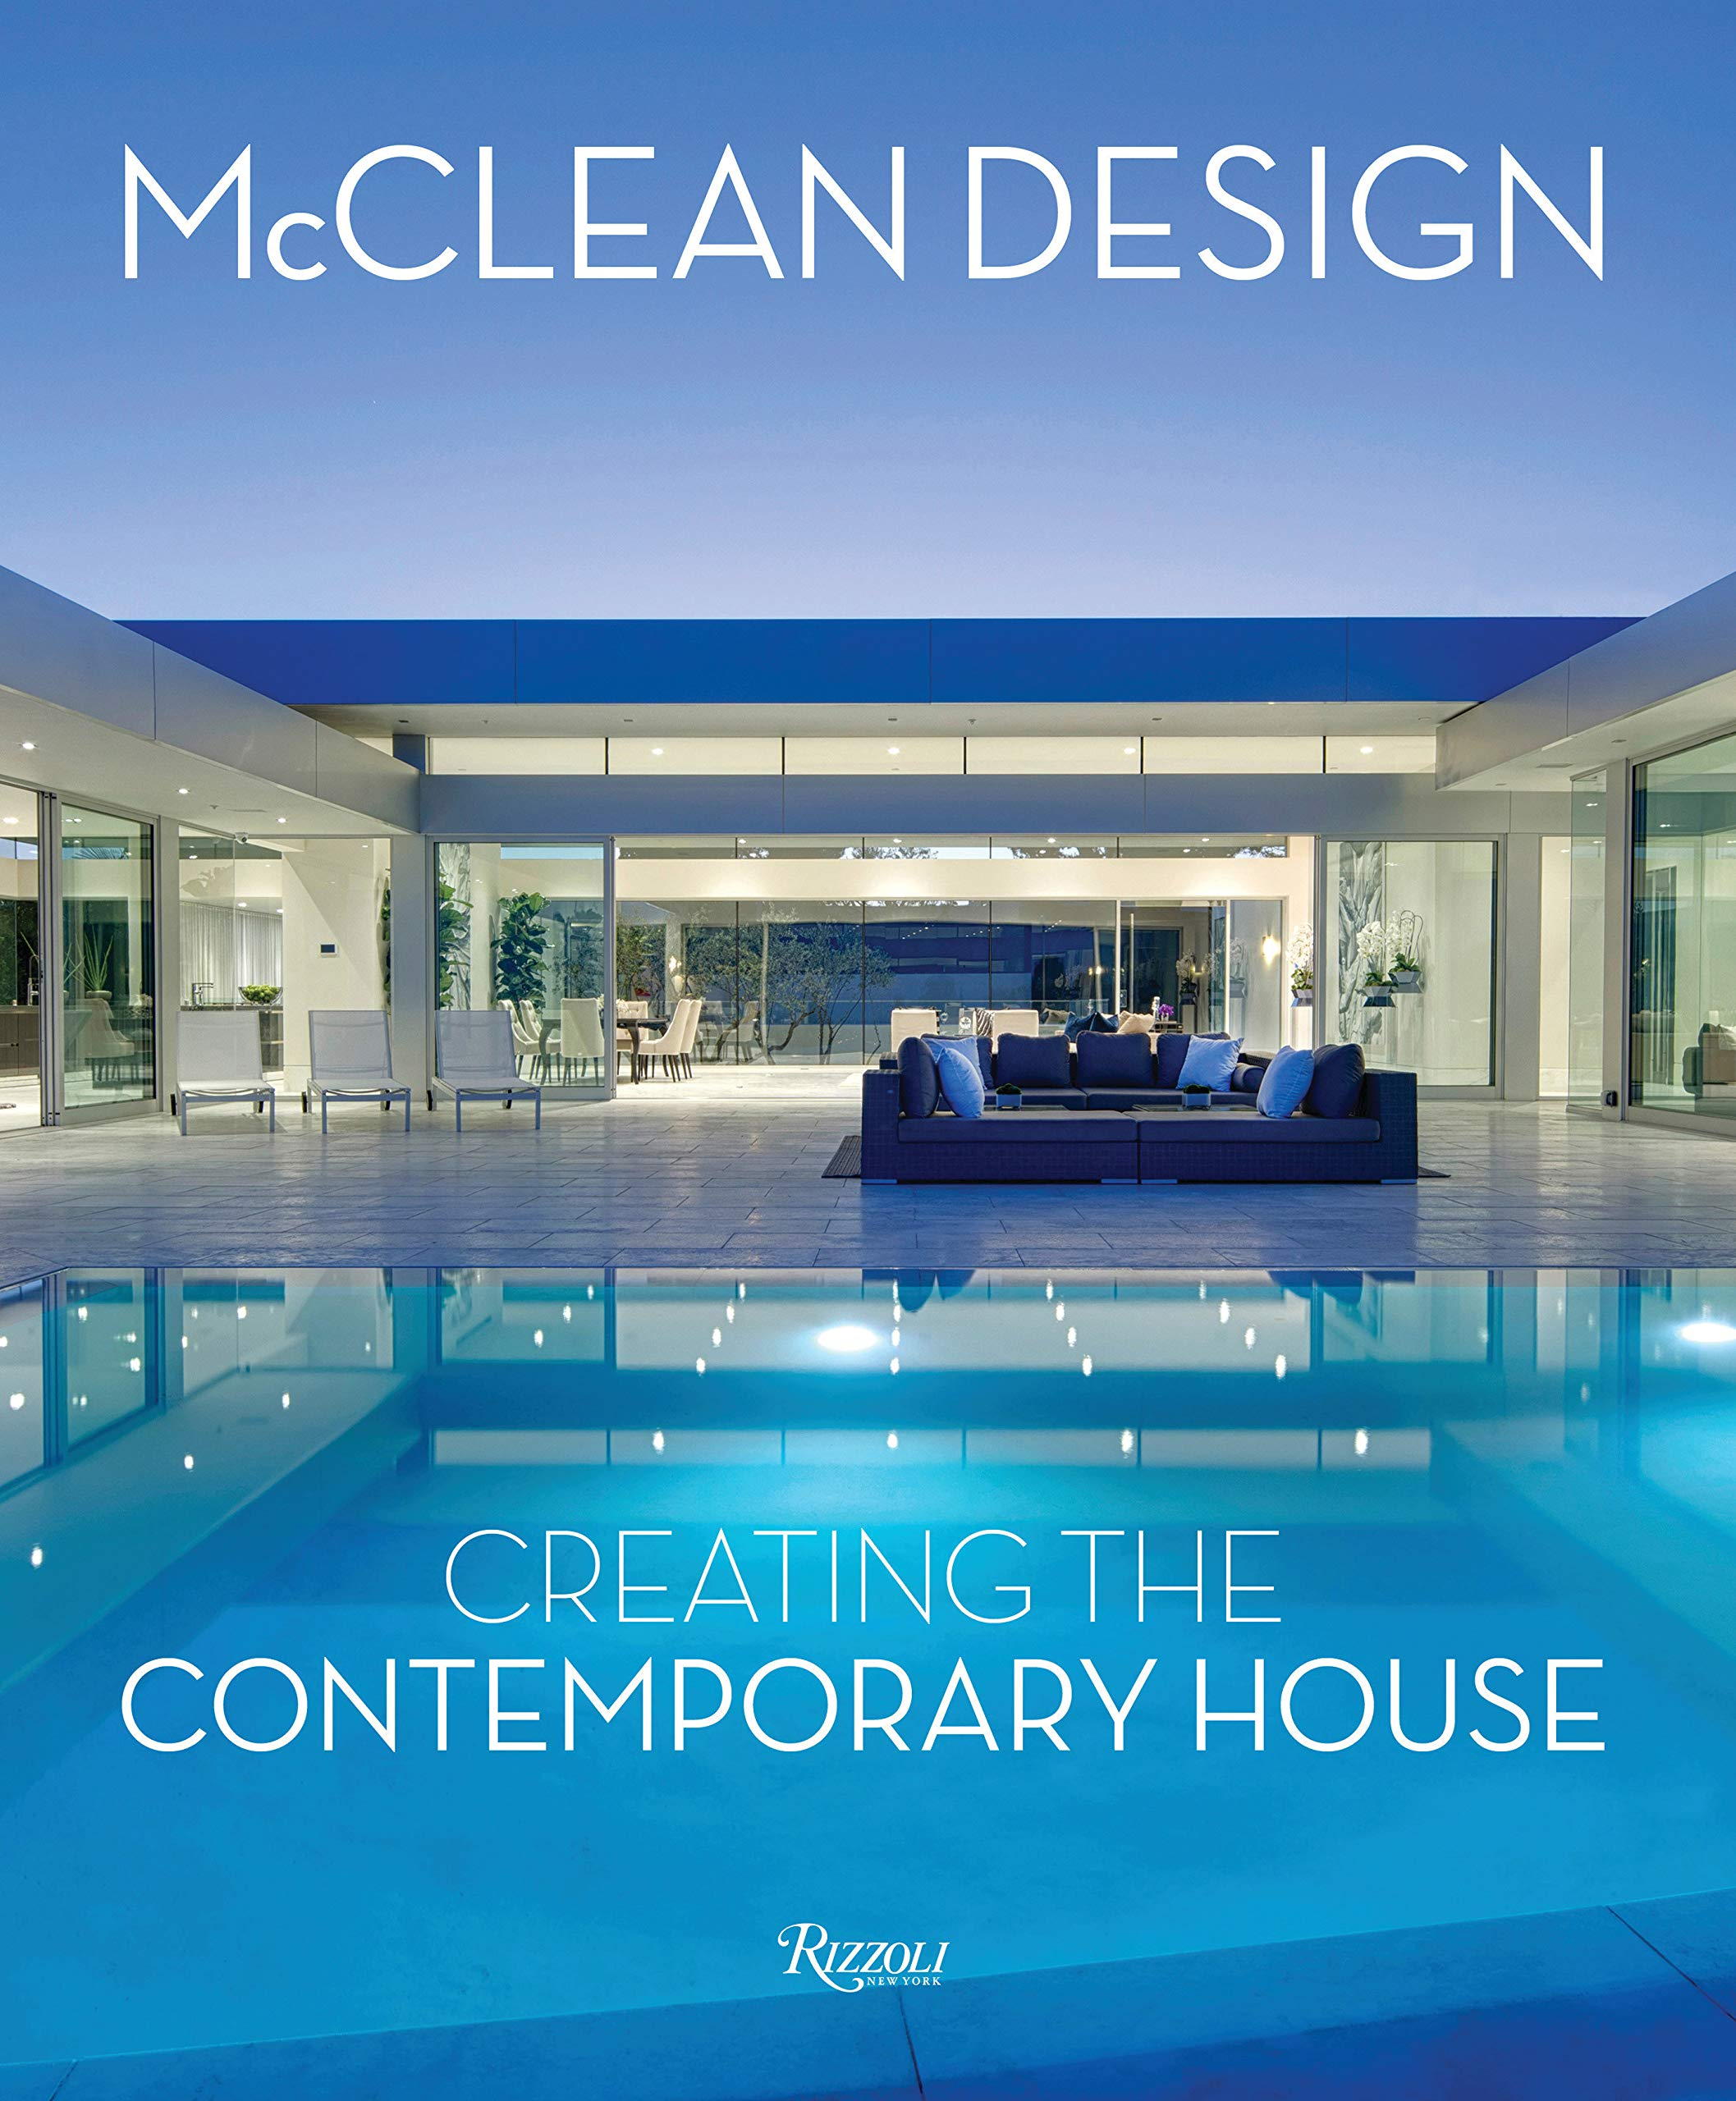 Mcclean Design Creating The Contemporary House Jodidio Philip Mccollough Niall Mulvin Valerie Mcclean Paul 9780847863501 Amazon Com Books